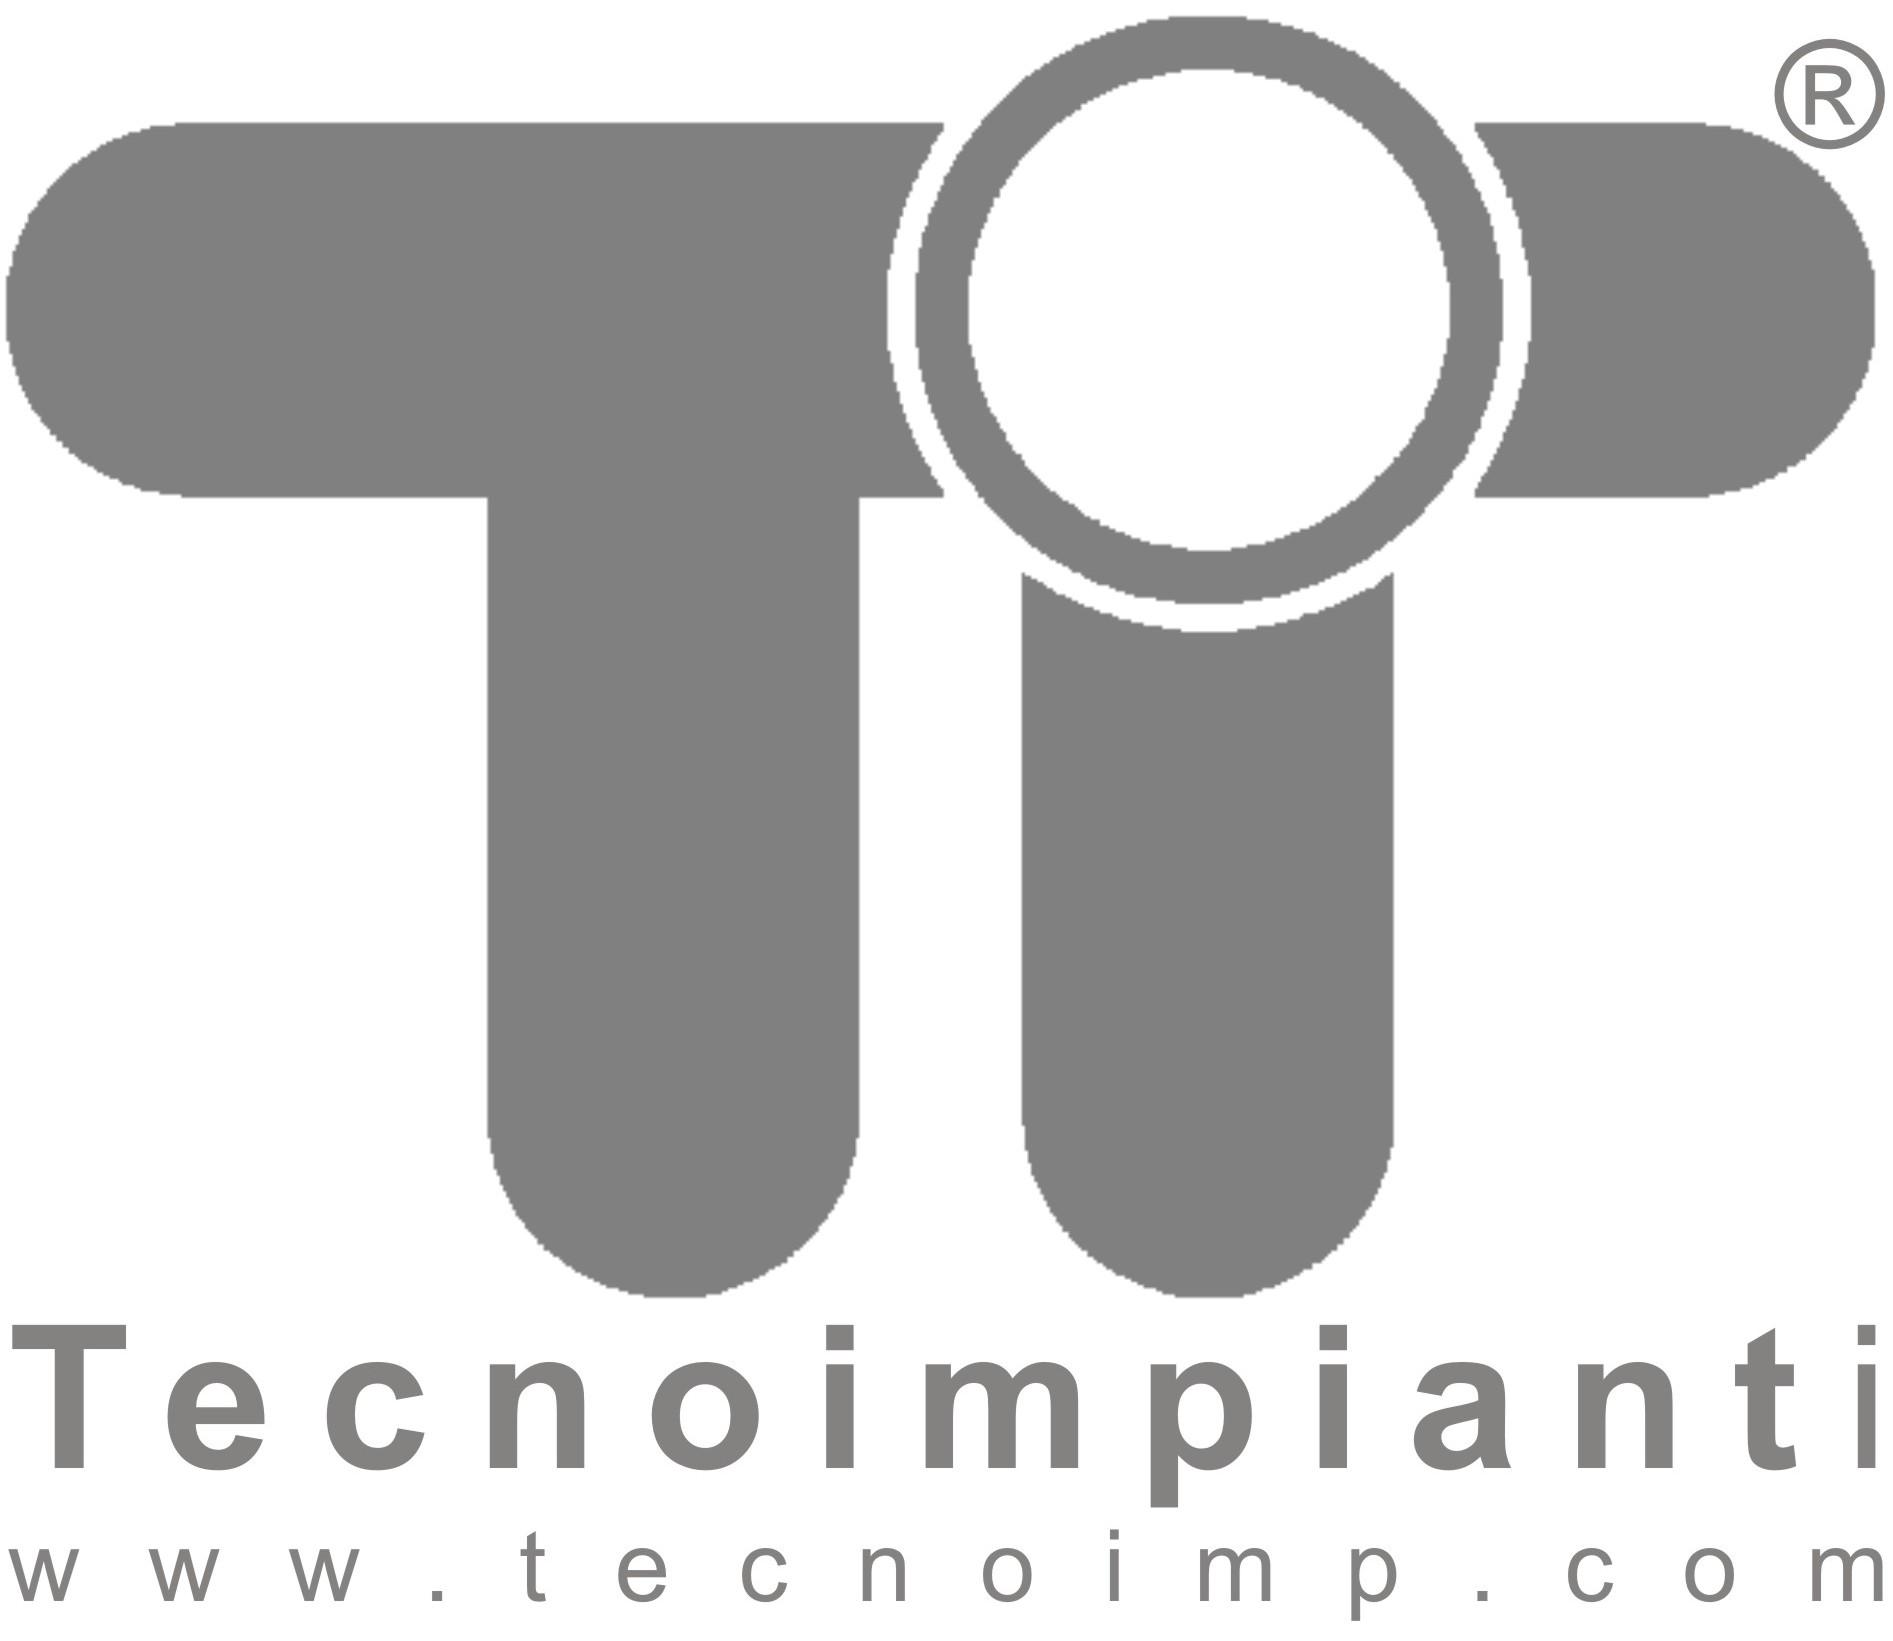 tecnoimpianti-water-trearment-s-r-l